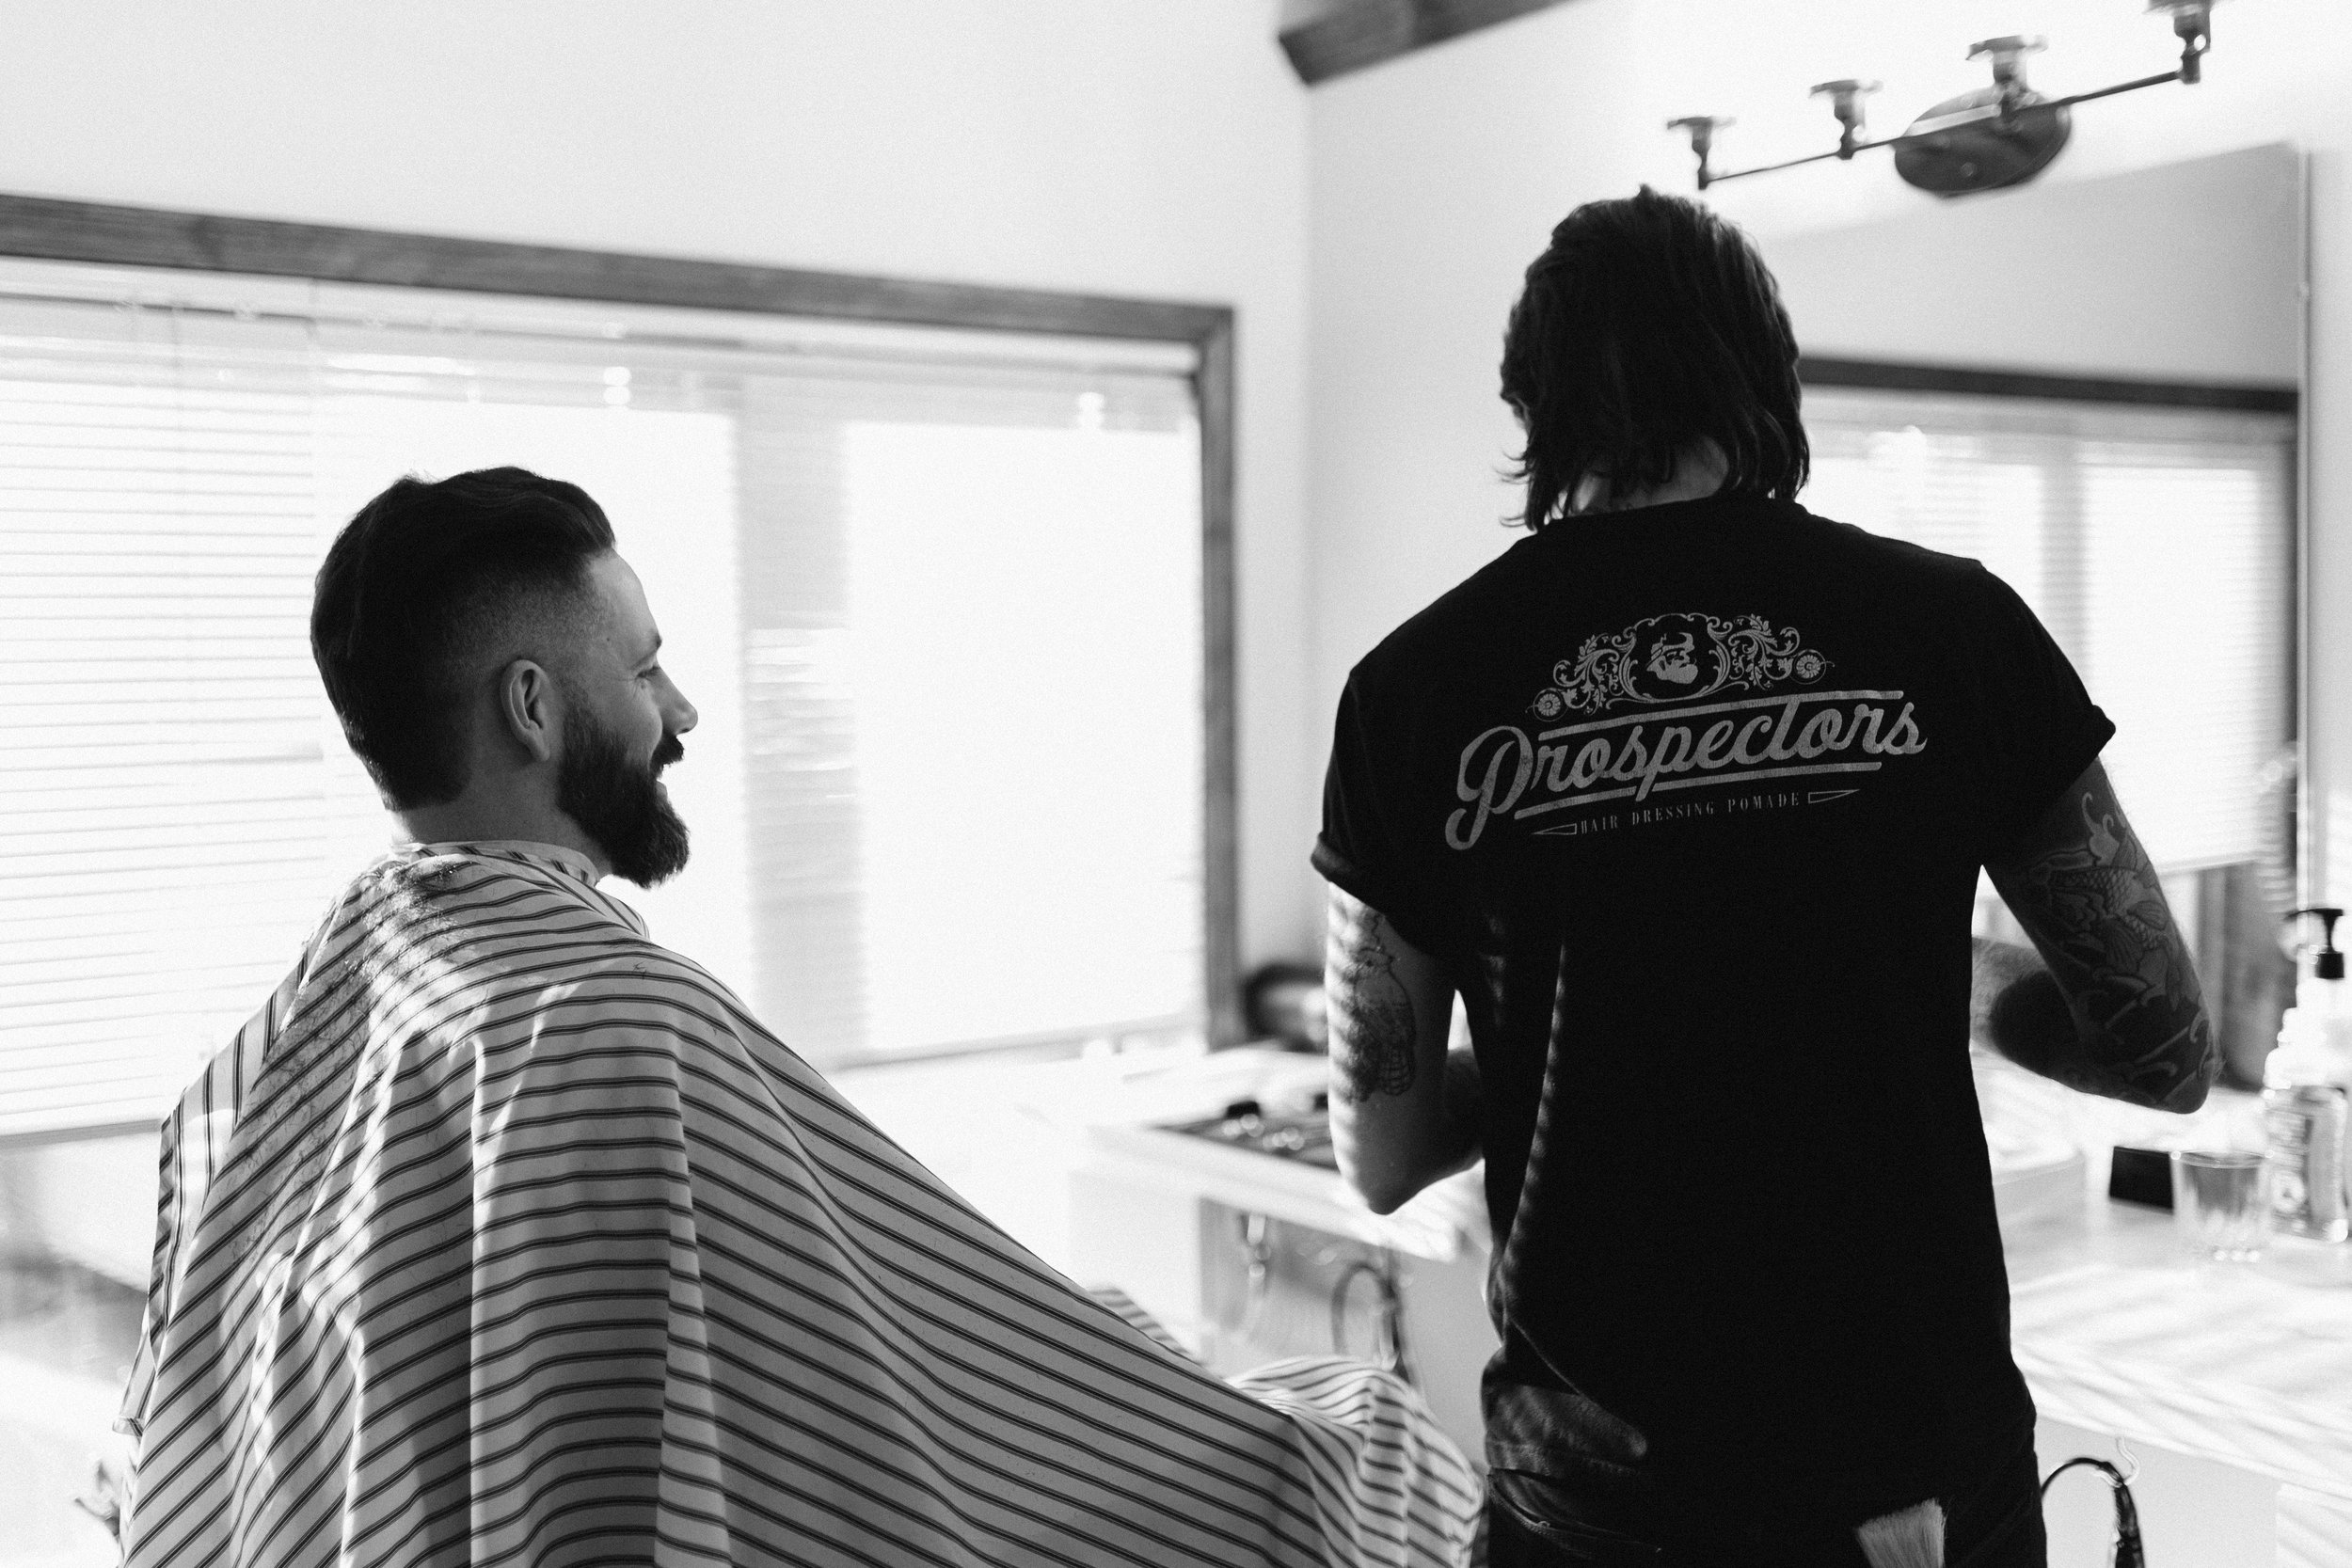 021018 - union barber 18.jpg